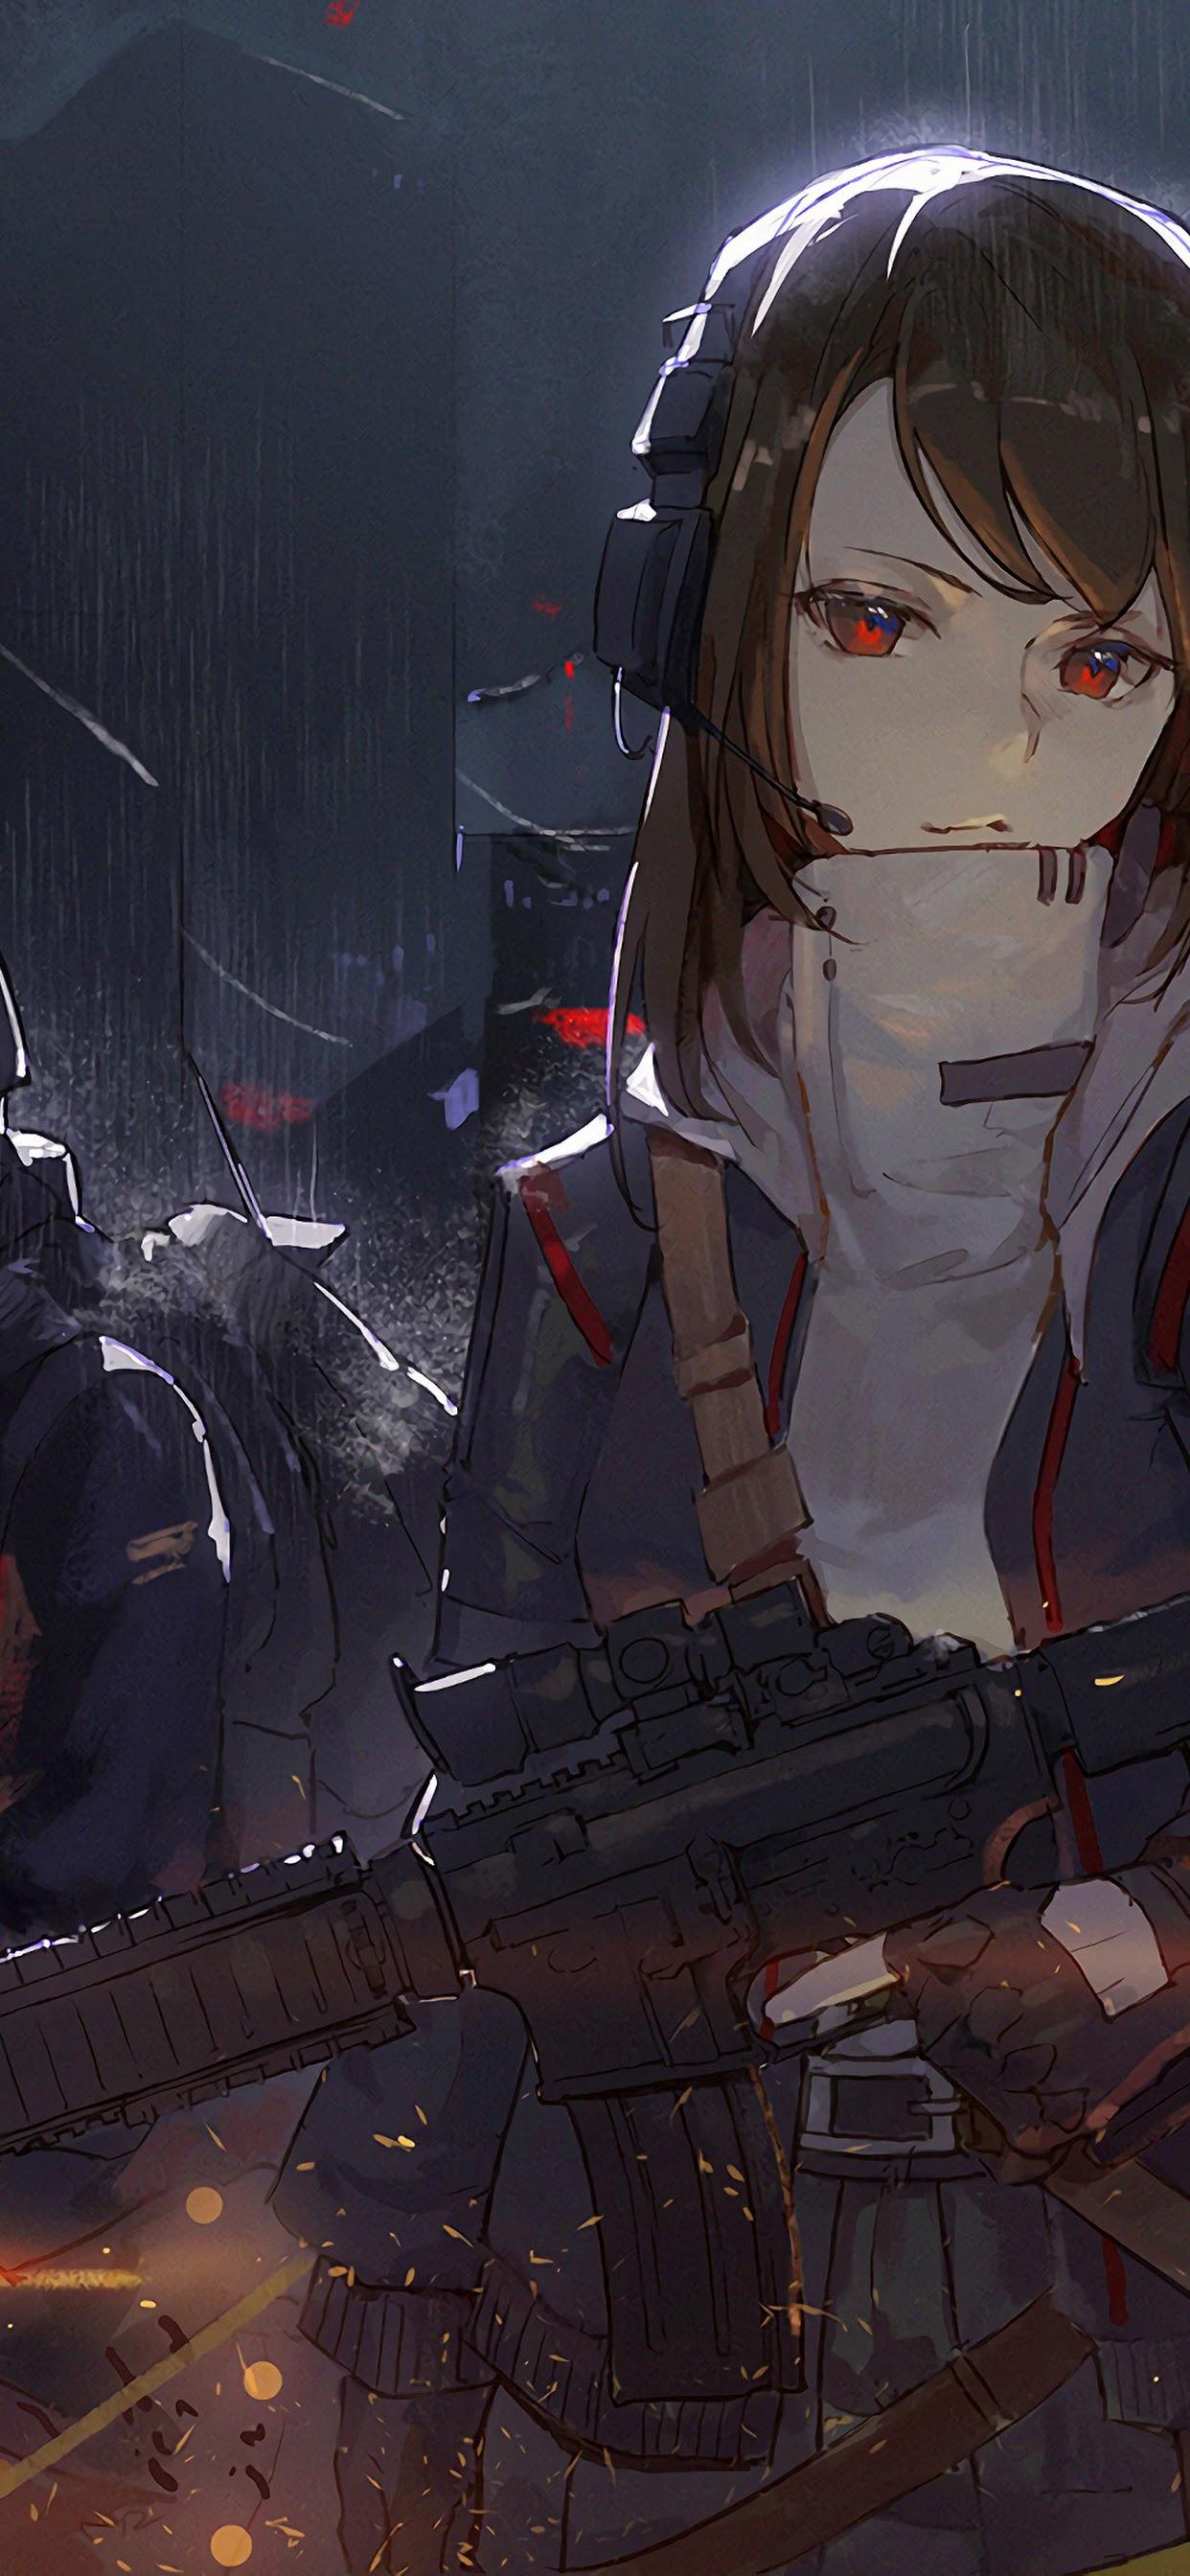 Anime Girl Soldier 4K 3840x2160 Wallpaper 19 1242x2688